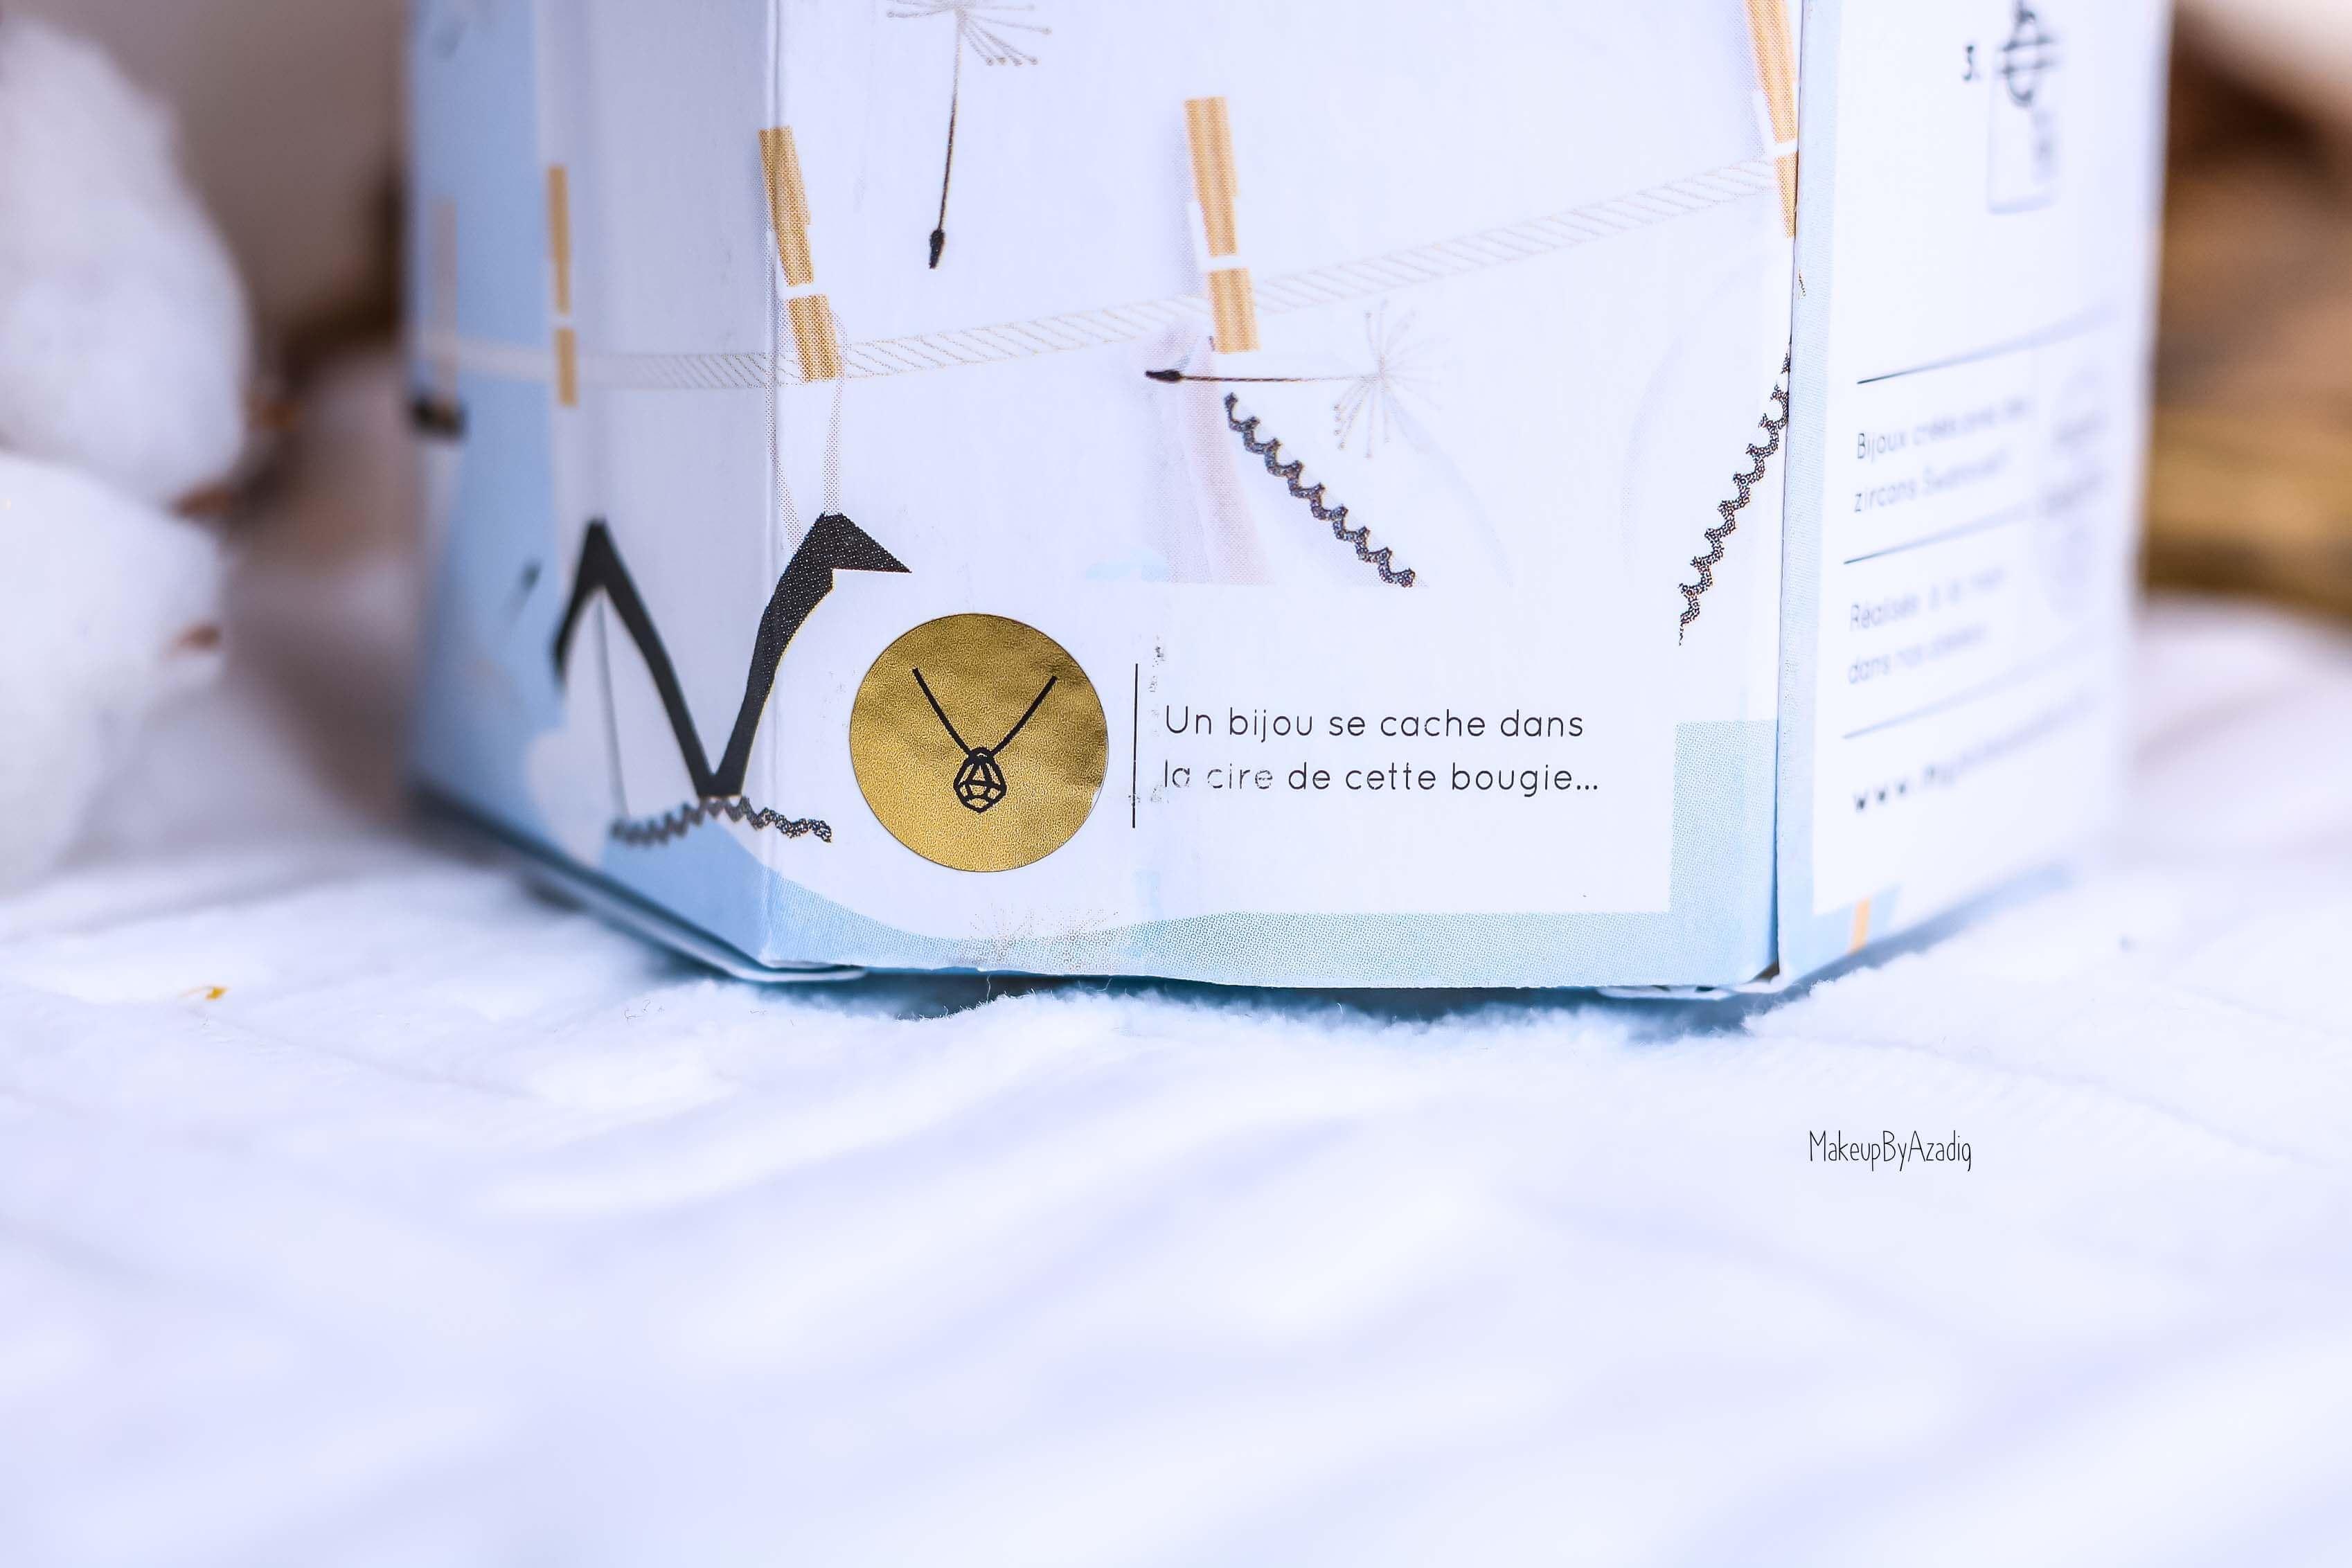 revue-bougie-bijou-qualite-myjoliecandle-linge-frais-propre-code-promo-makeupbyazadig-collier-bracelet-bague-avis-prix-cadeau-femme-or